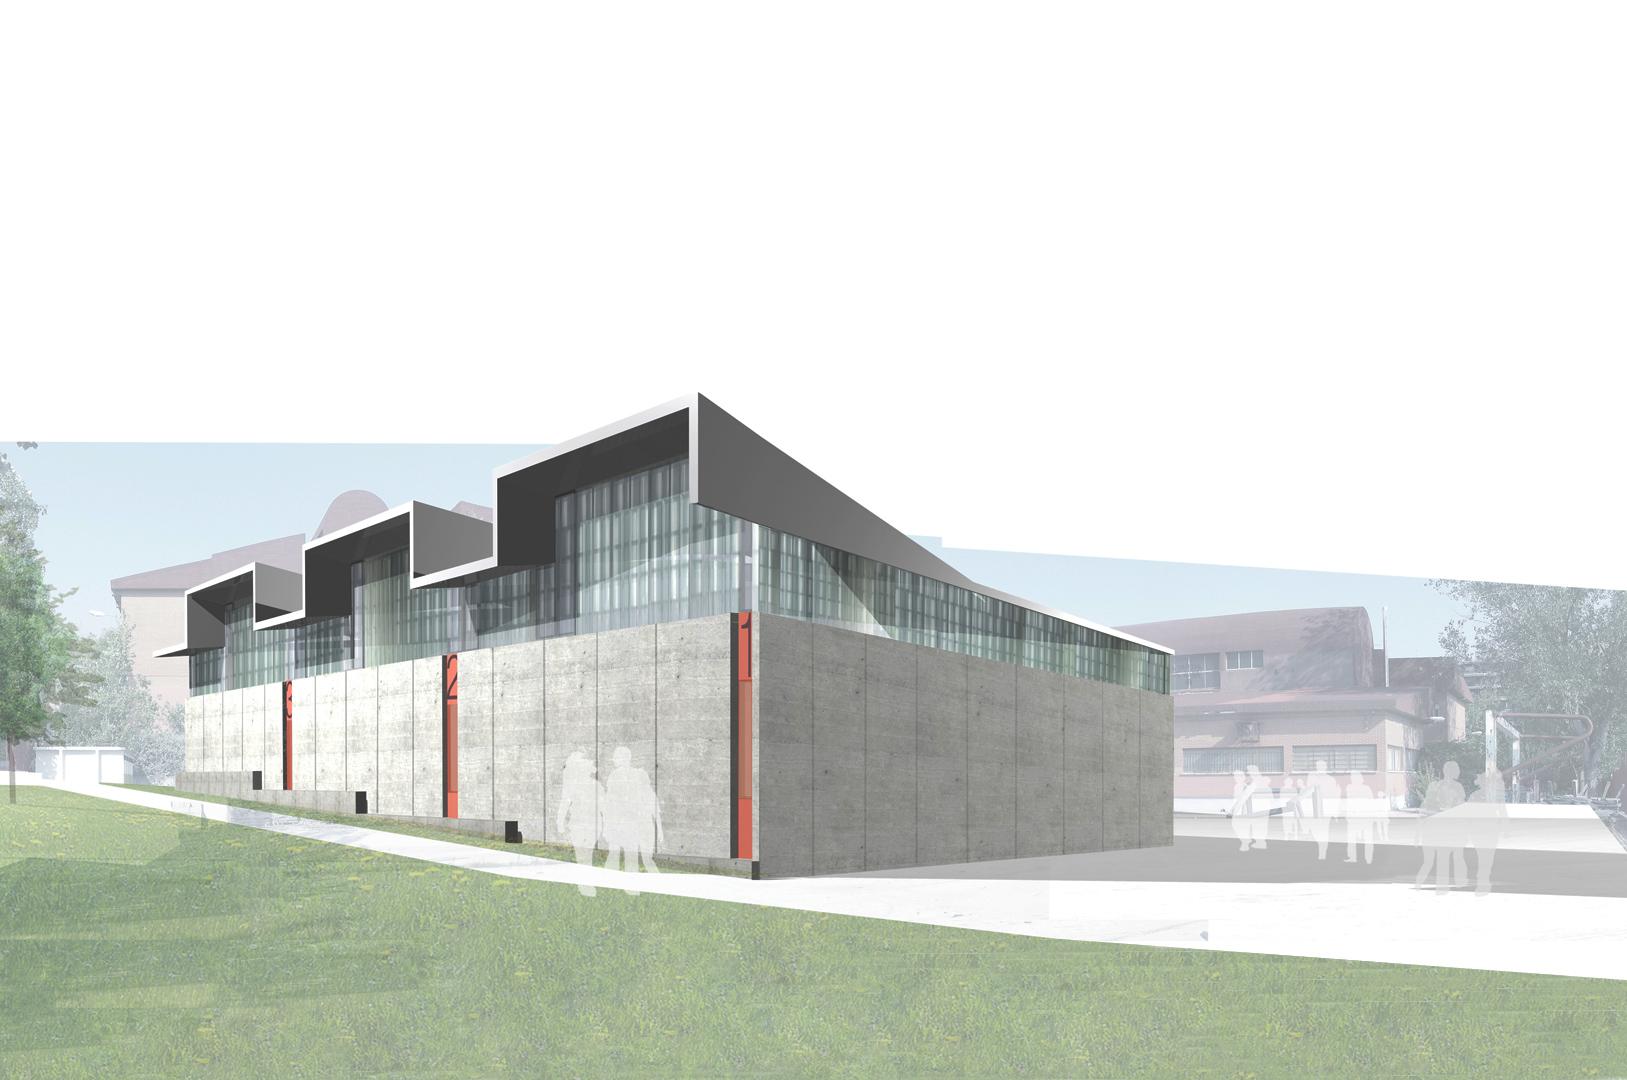 Naves para escuela taller alcorc n madrid enves for Restaurante escuela de arquitectos madrid